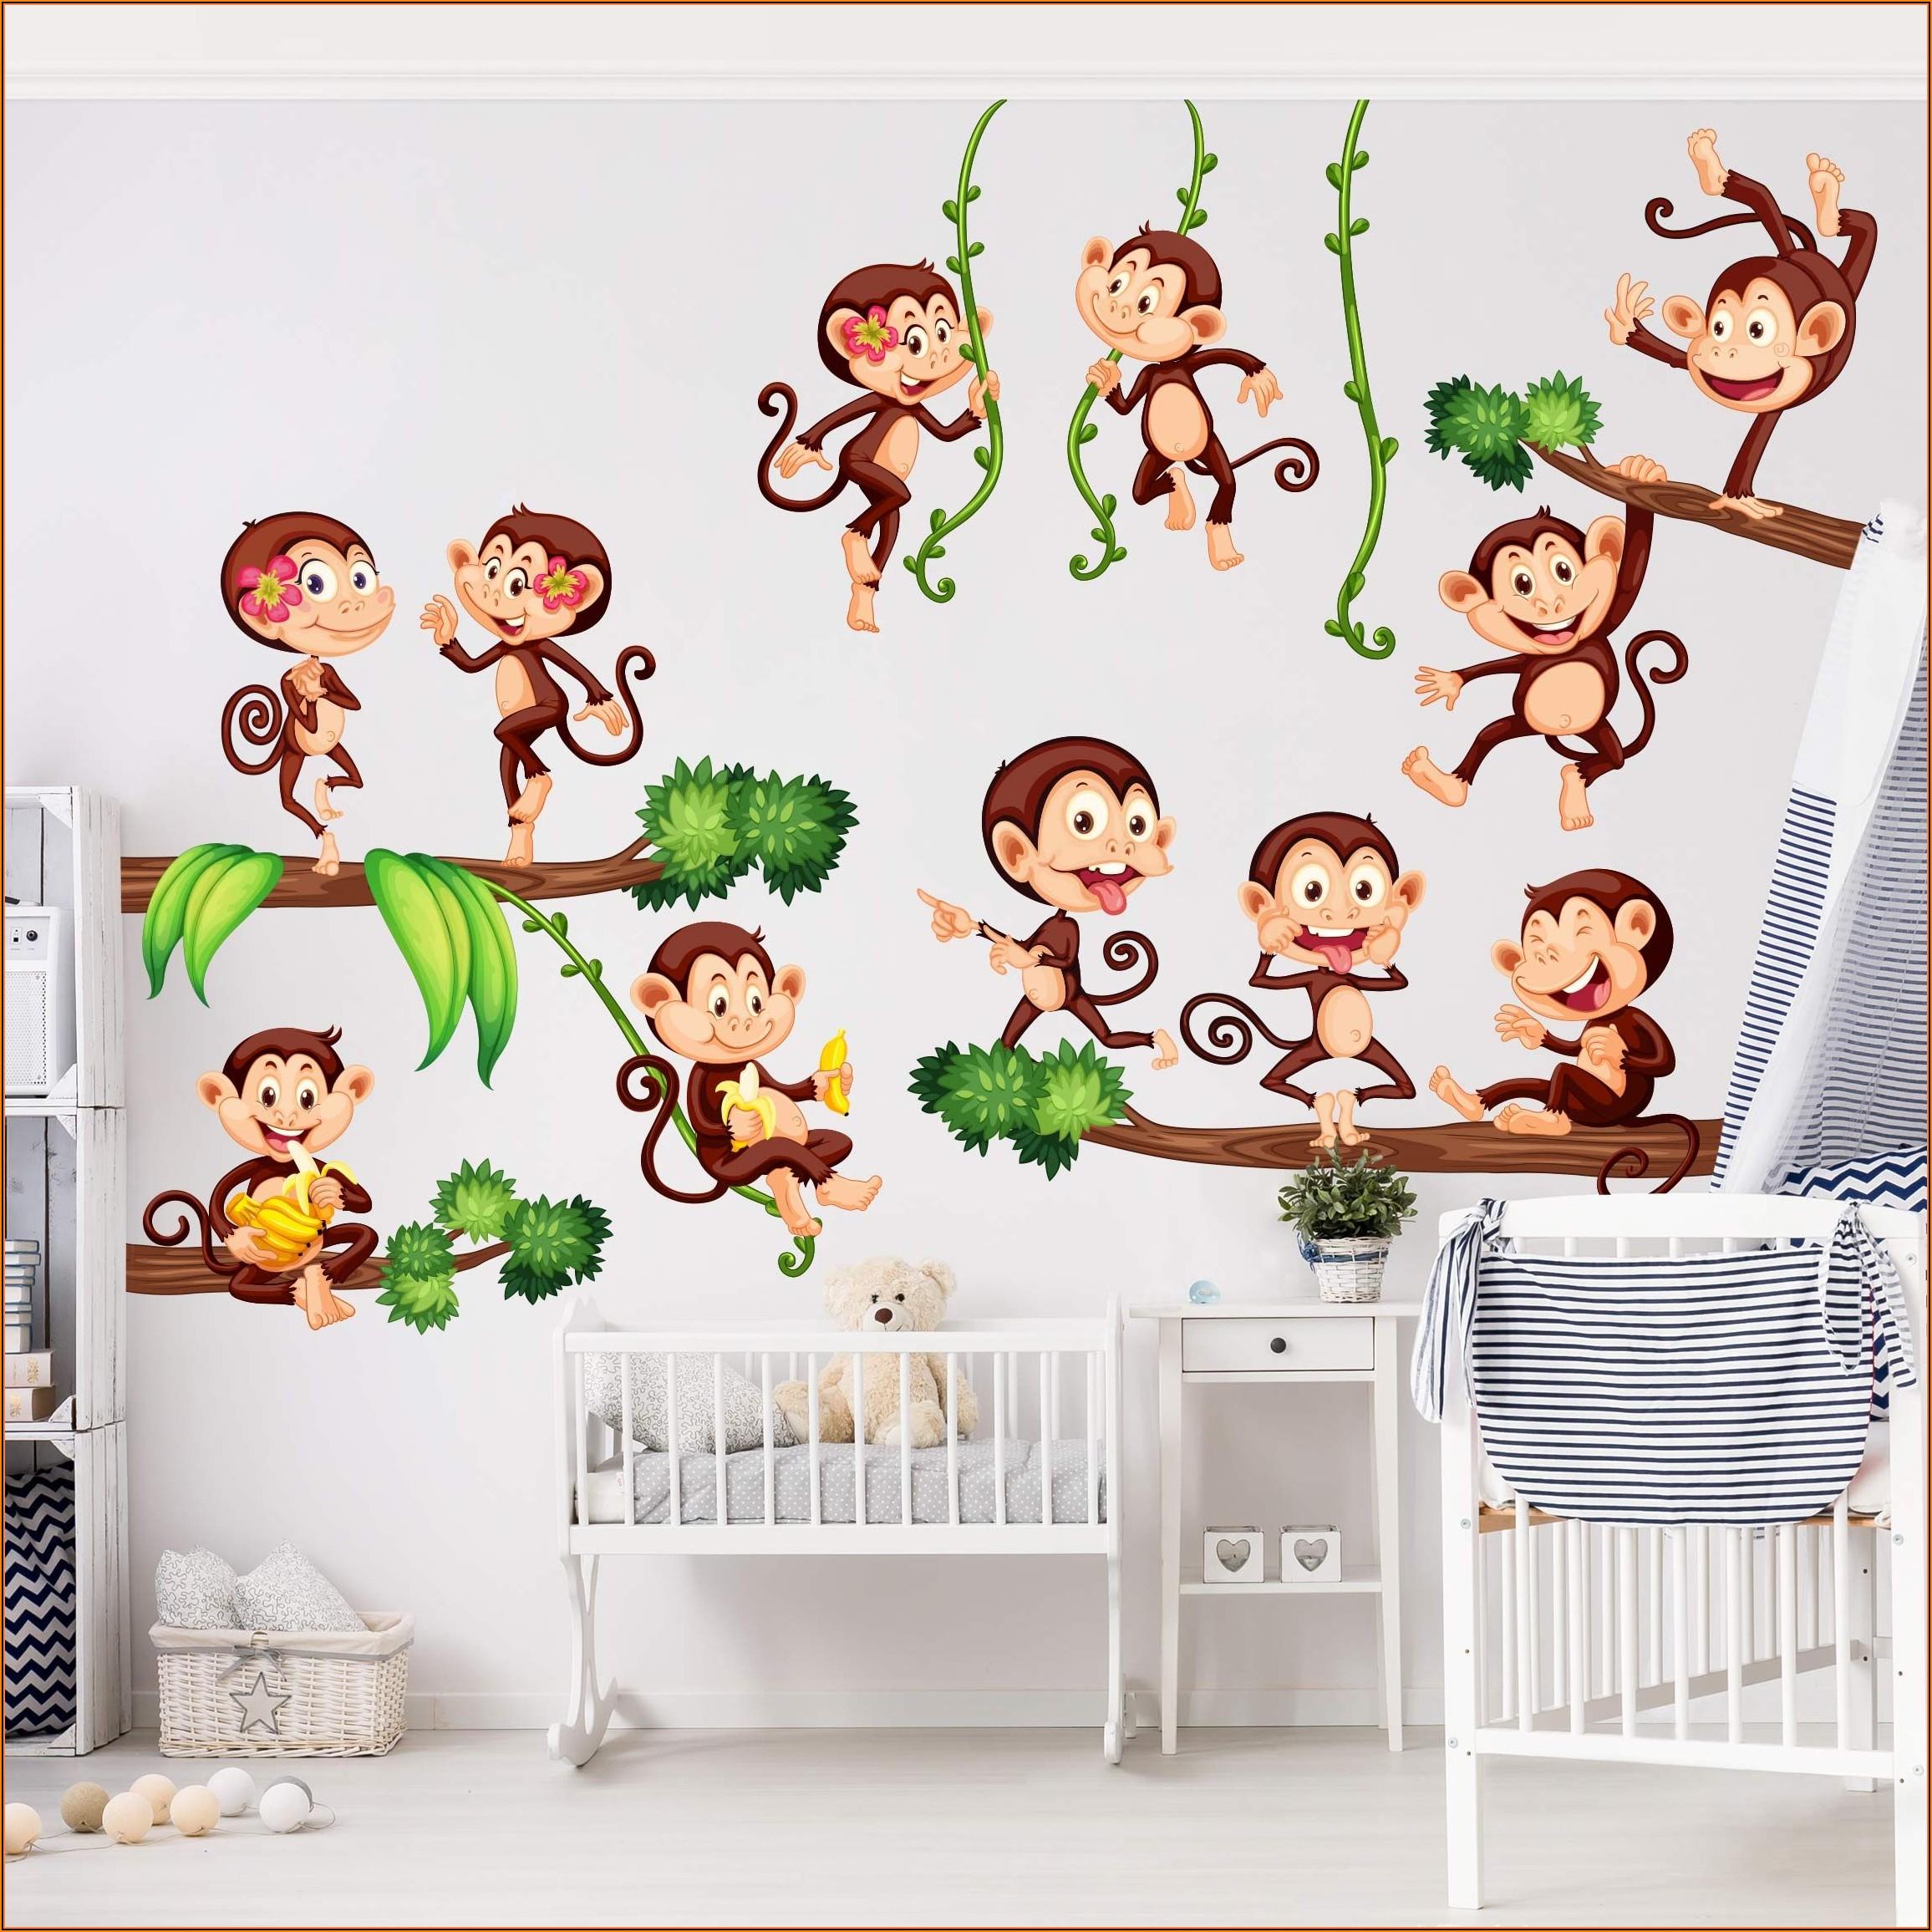 Wandtattoo Kinderzimmer Affen